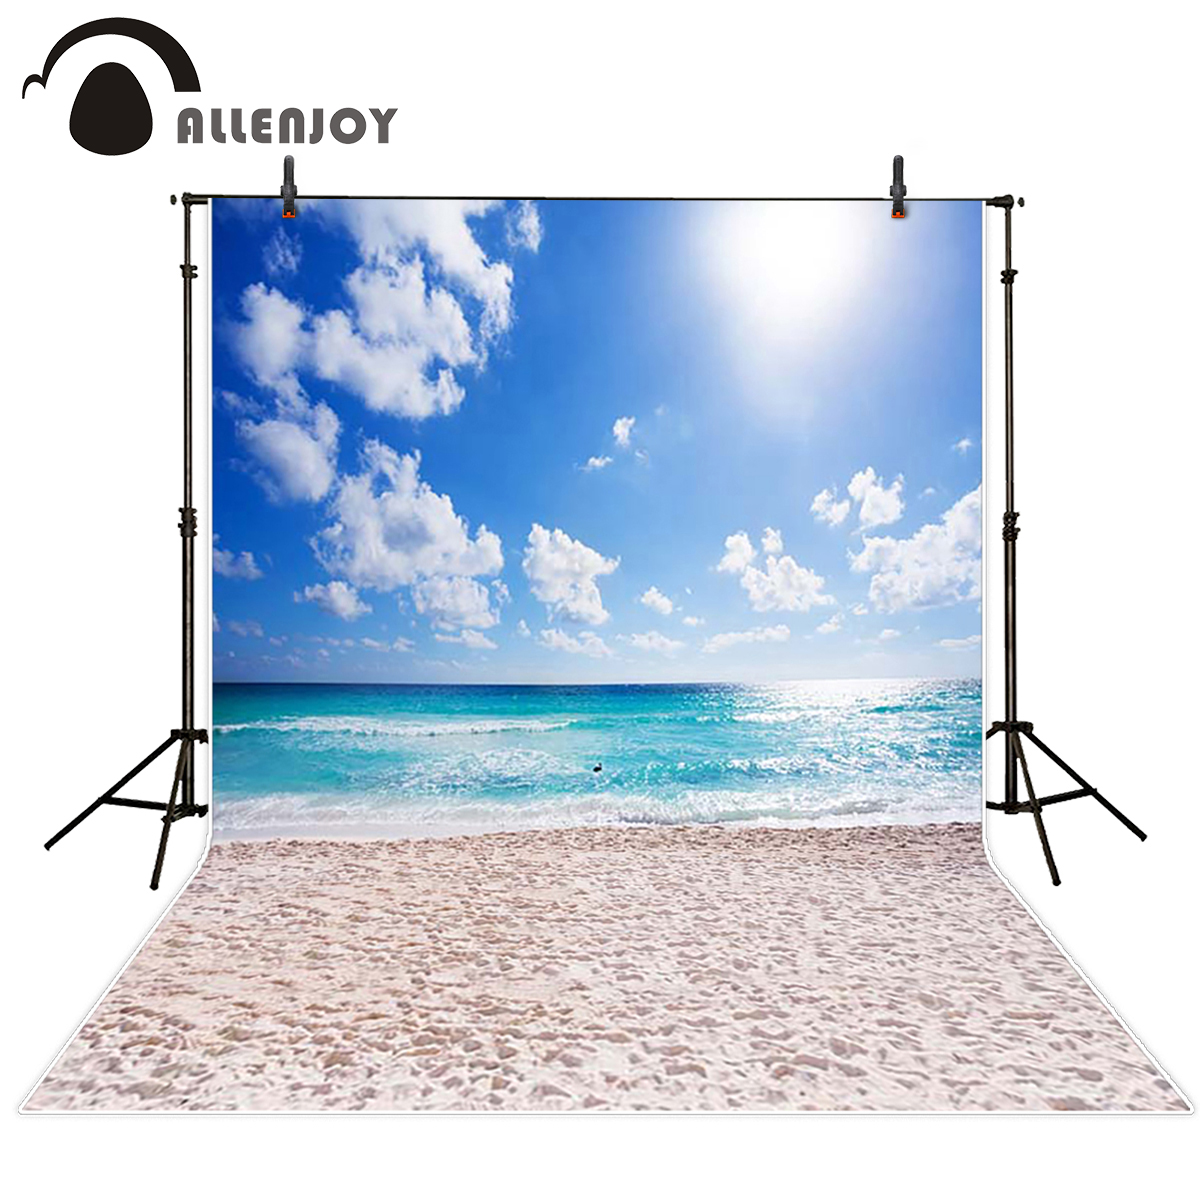 Allenjoy scenery photo backdrop Beach footprints sky sun blue sea photocall For a photo shoot background for photo studio blue sky чаша северный олень